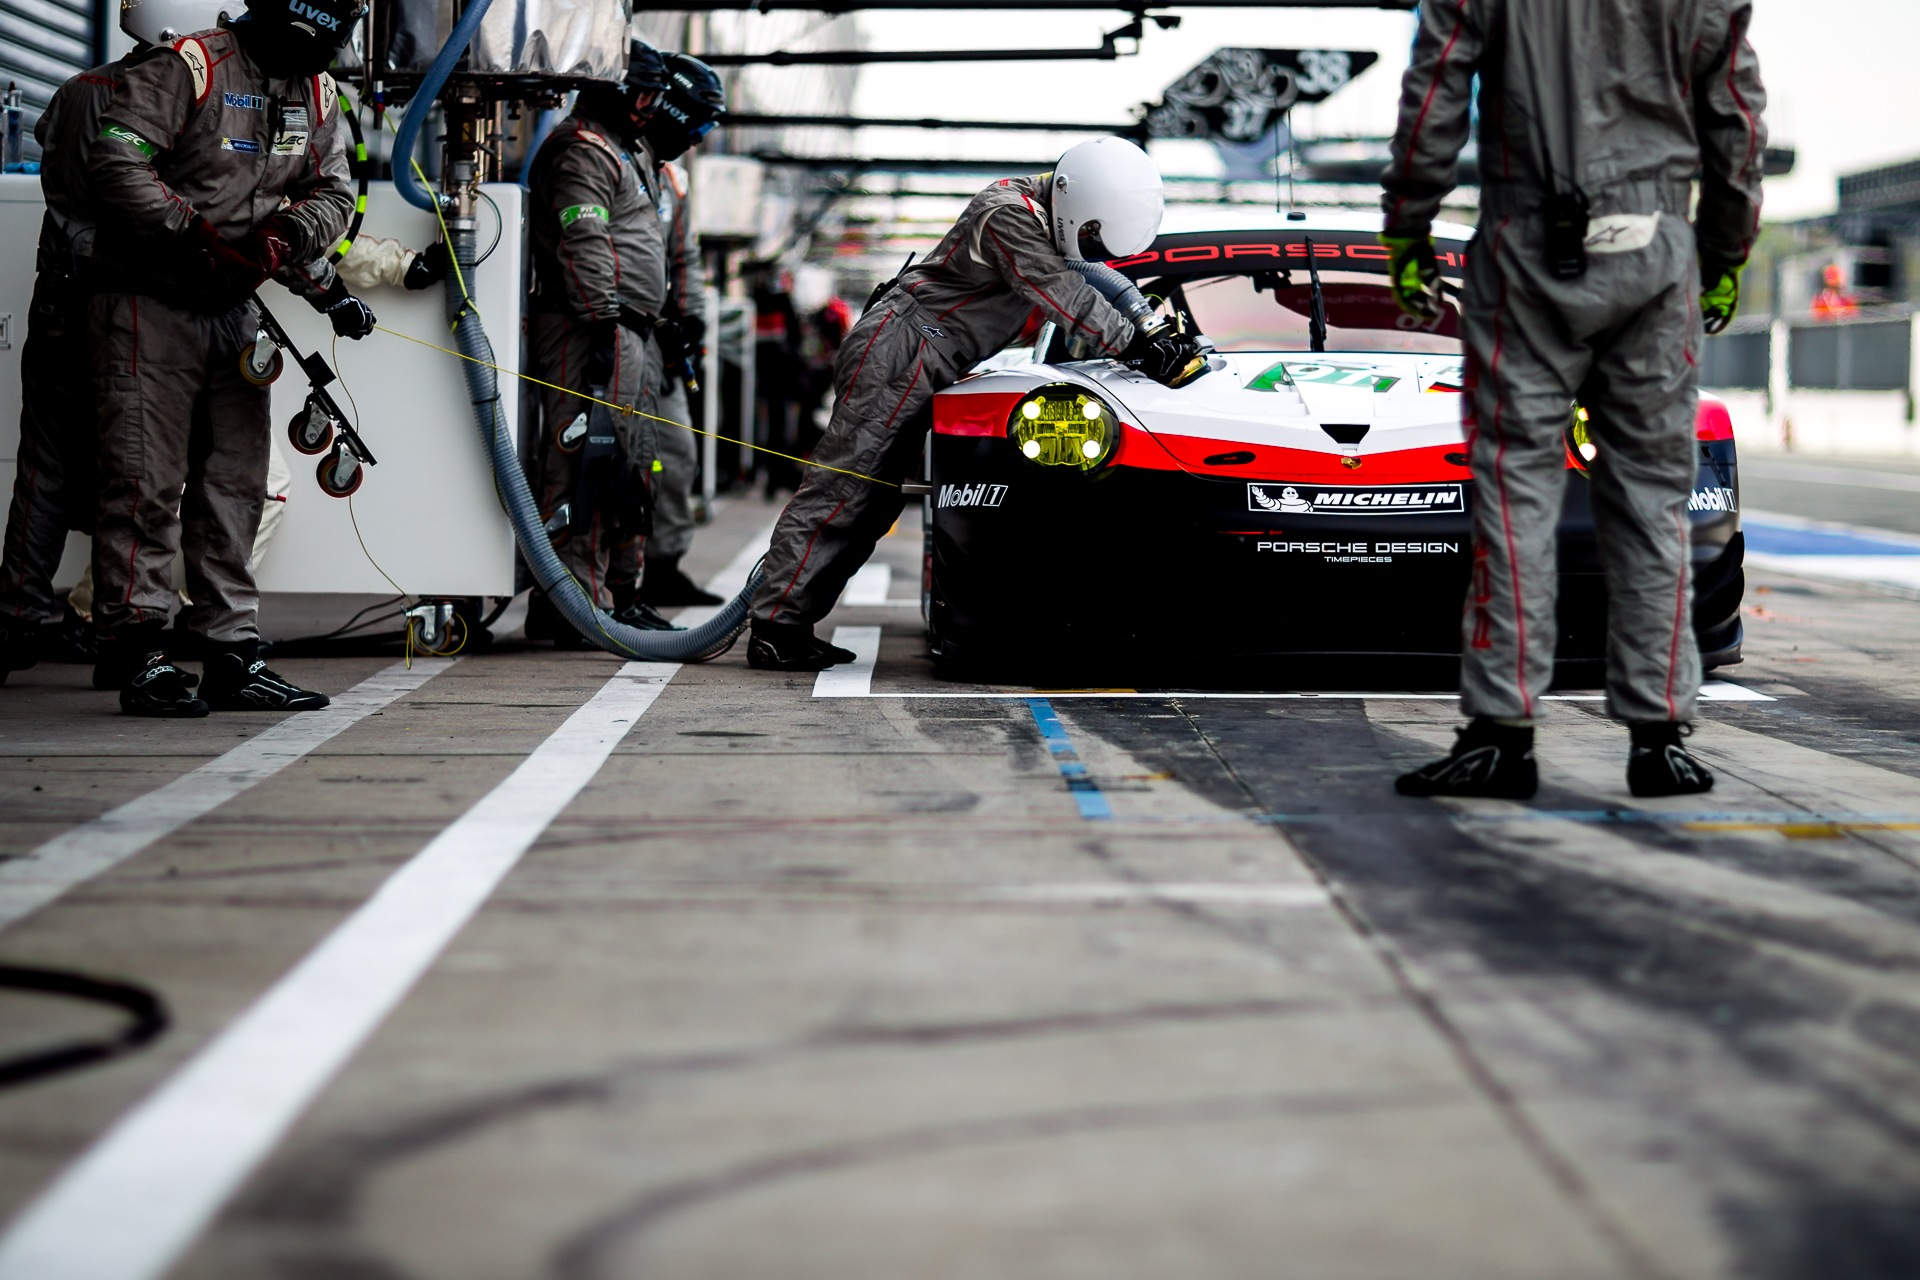 Porsche RSR Pitstop // © marcellanger / www.adrenalmedia.com